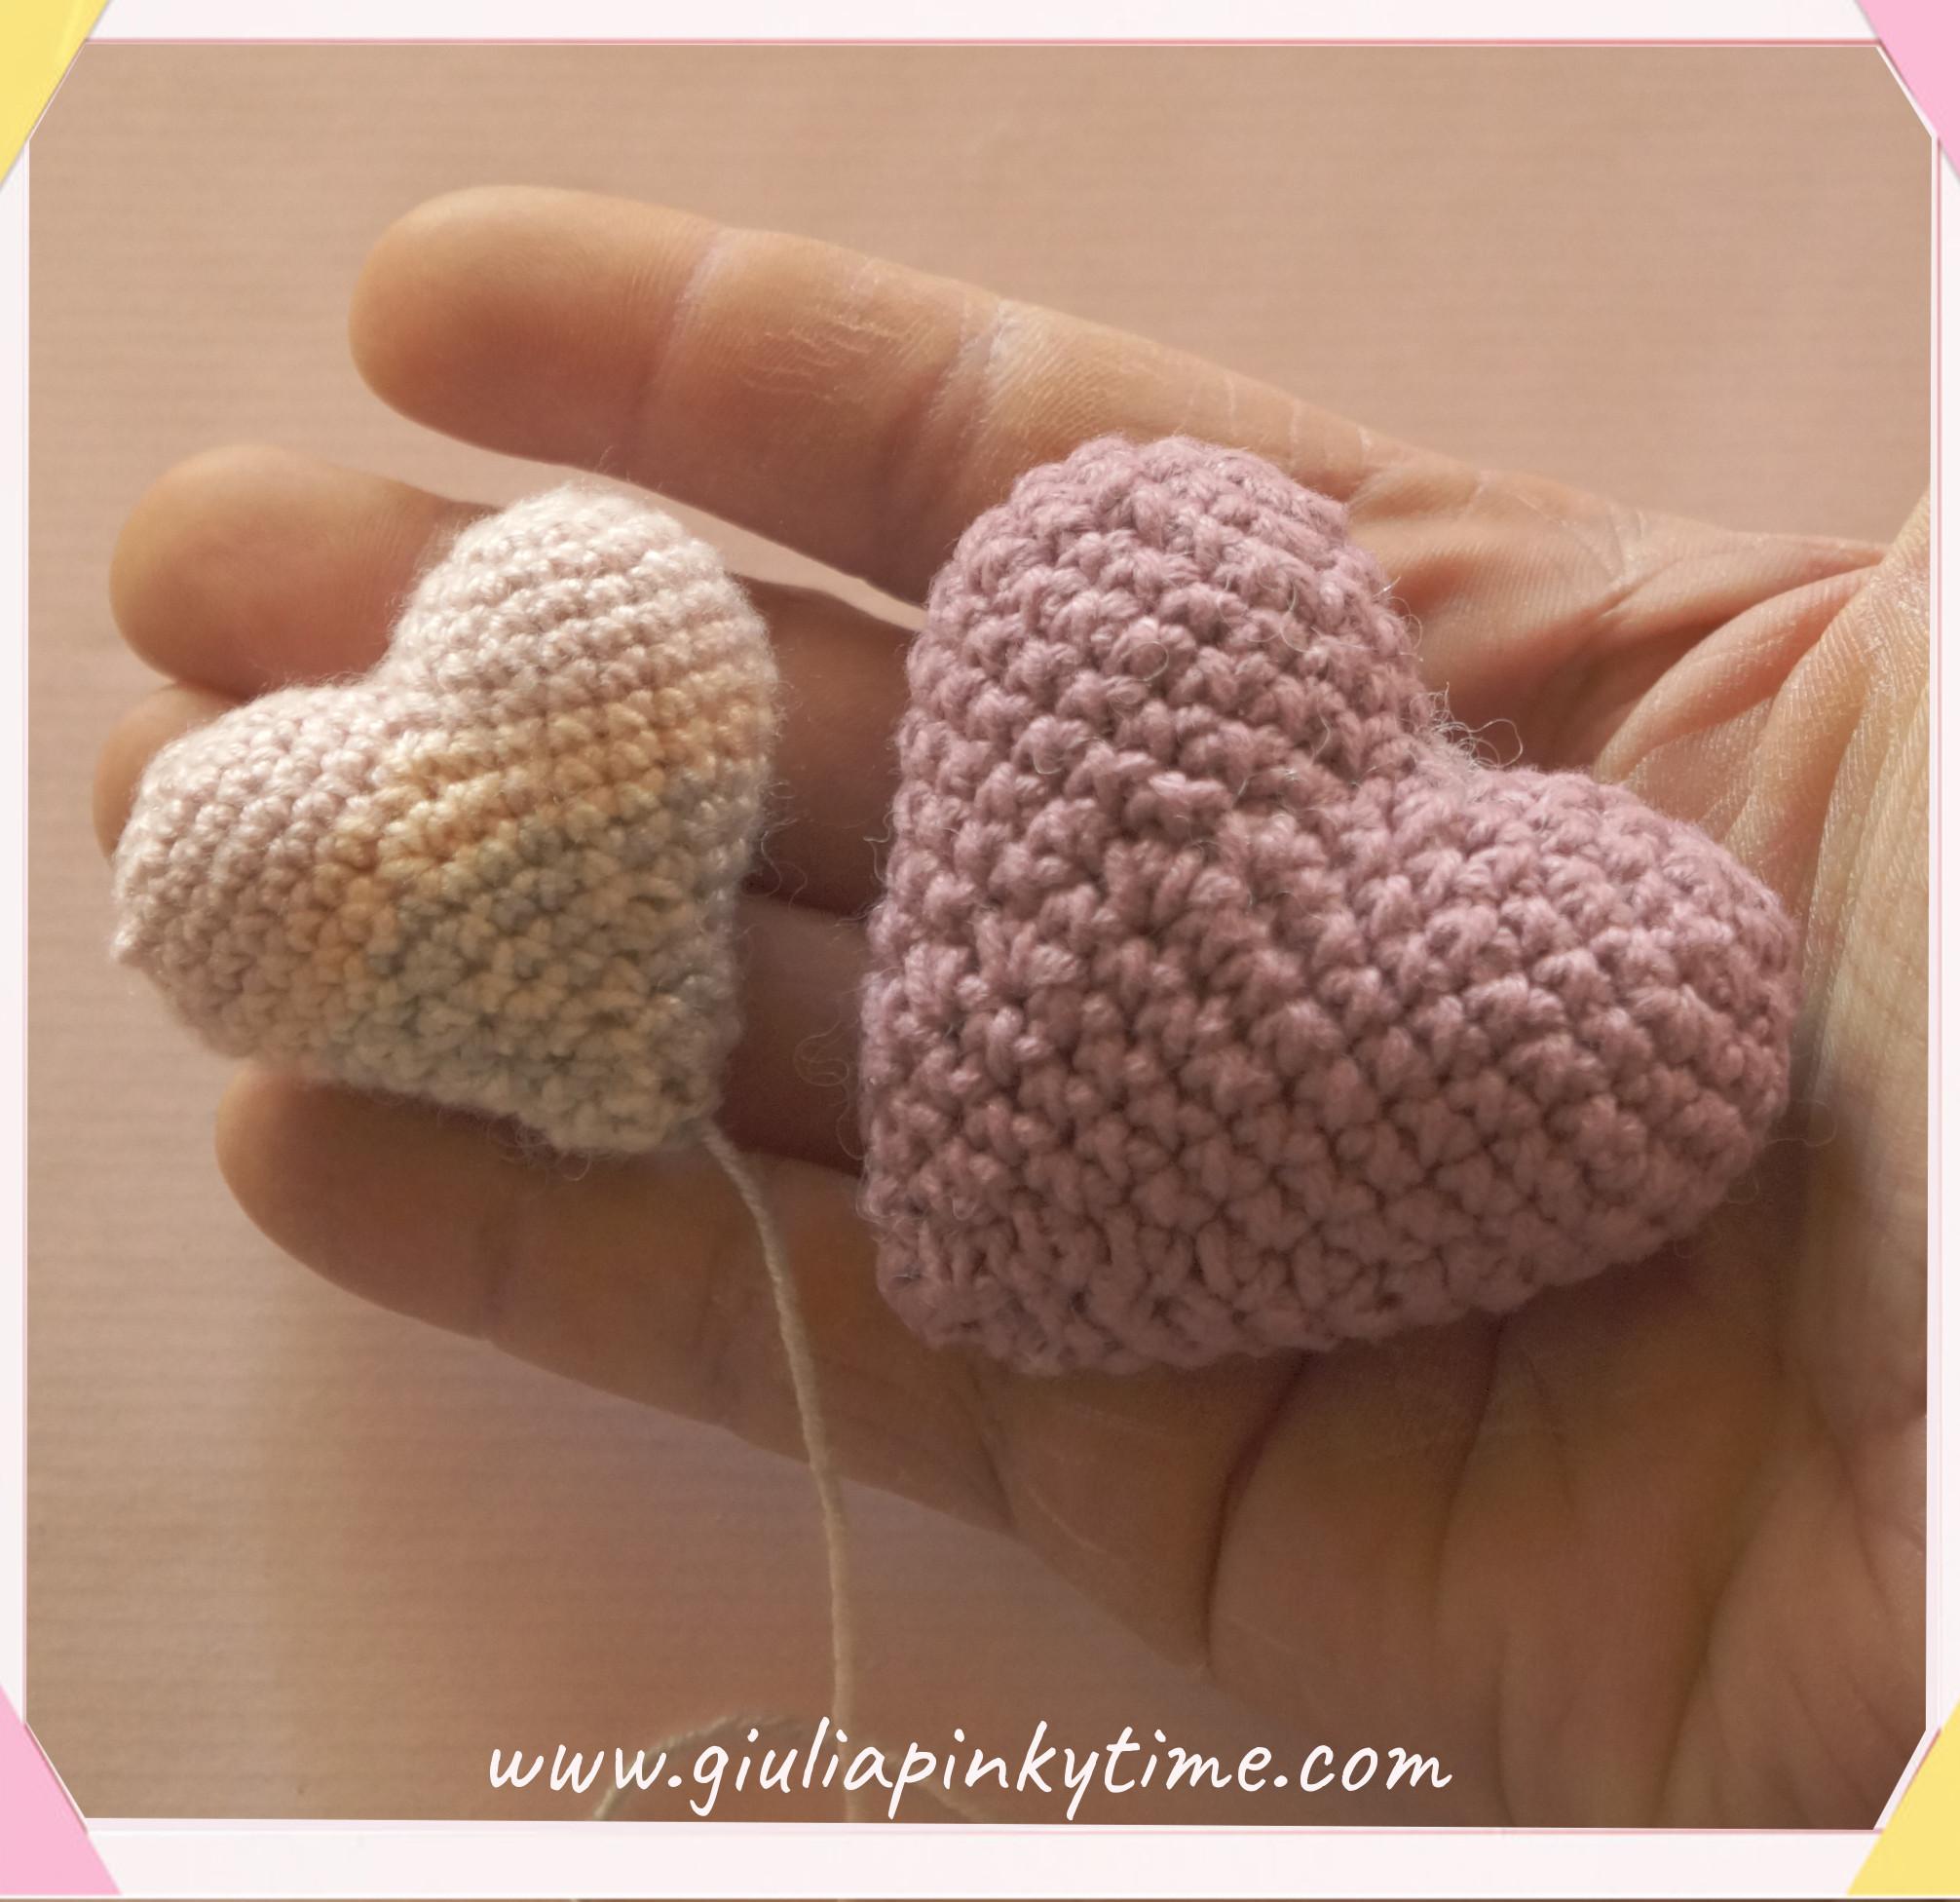 tutorial-cuore-puffy-amigurumi